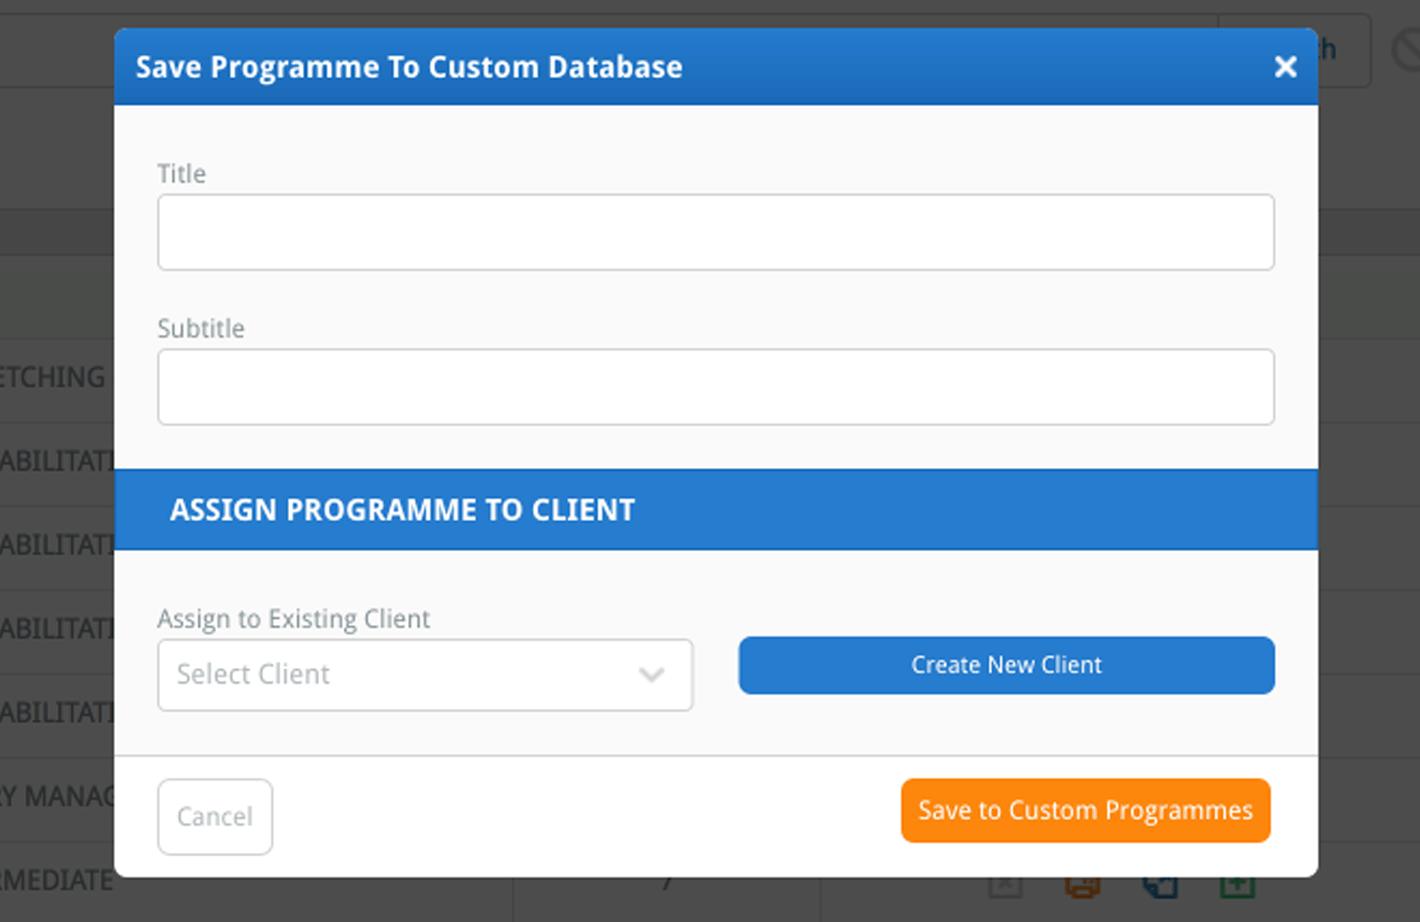 the Save Custom Programme window